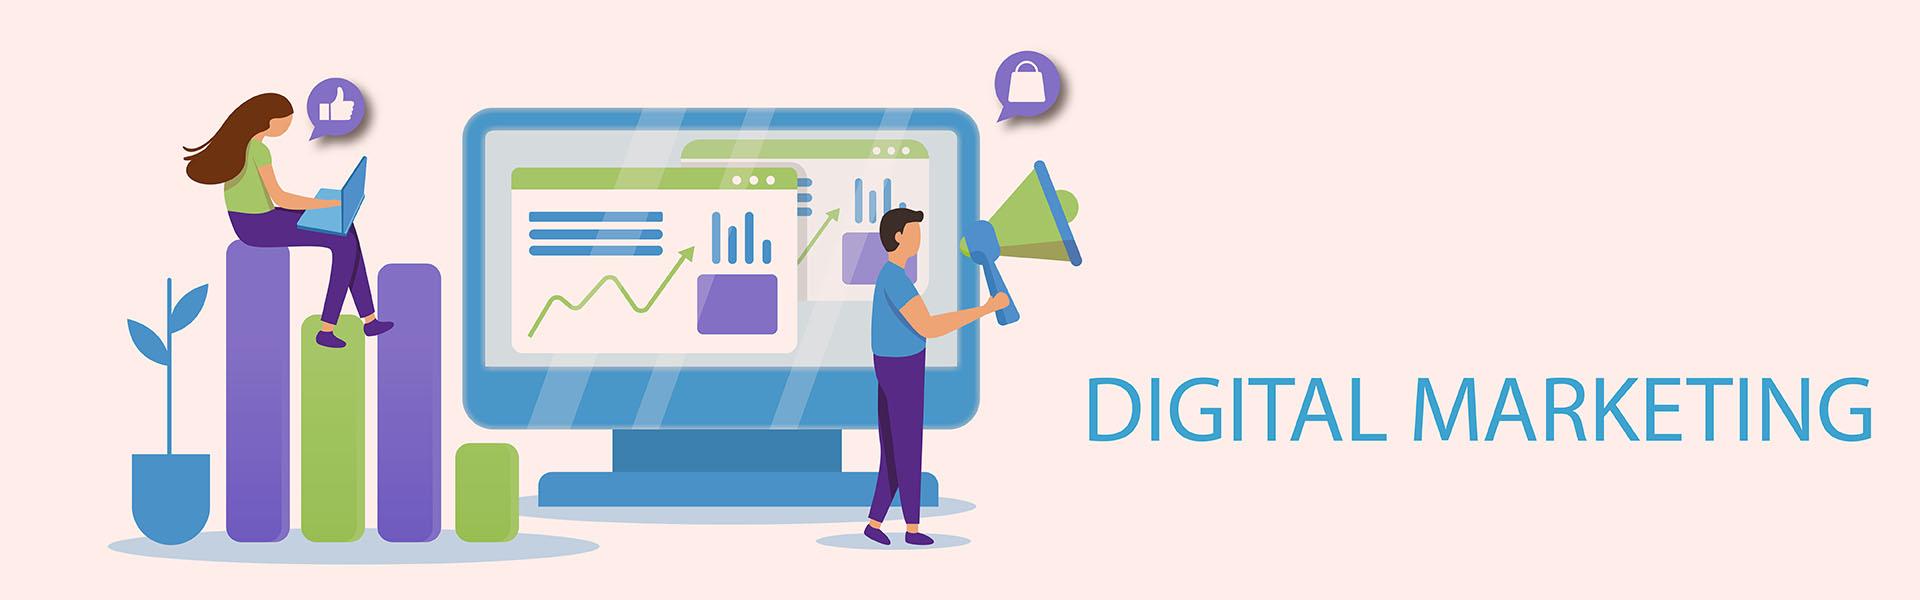 Digital Marketing Service | Digital Marketing Strategy | SEO